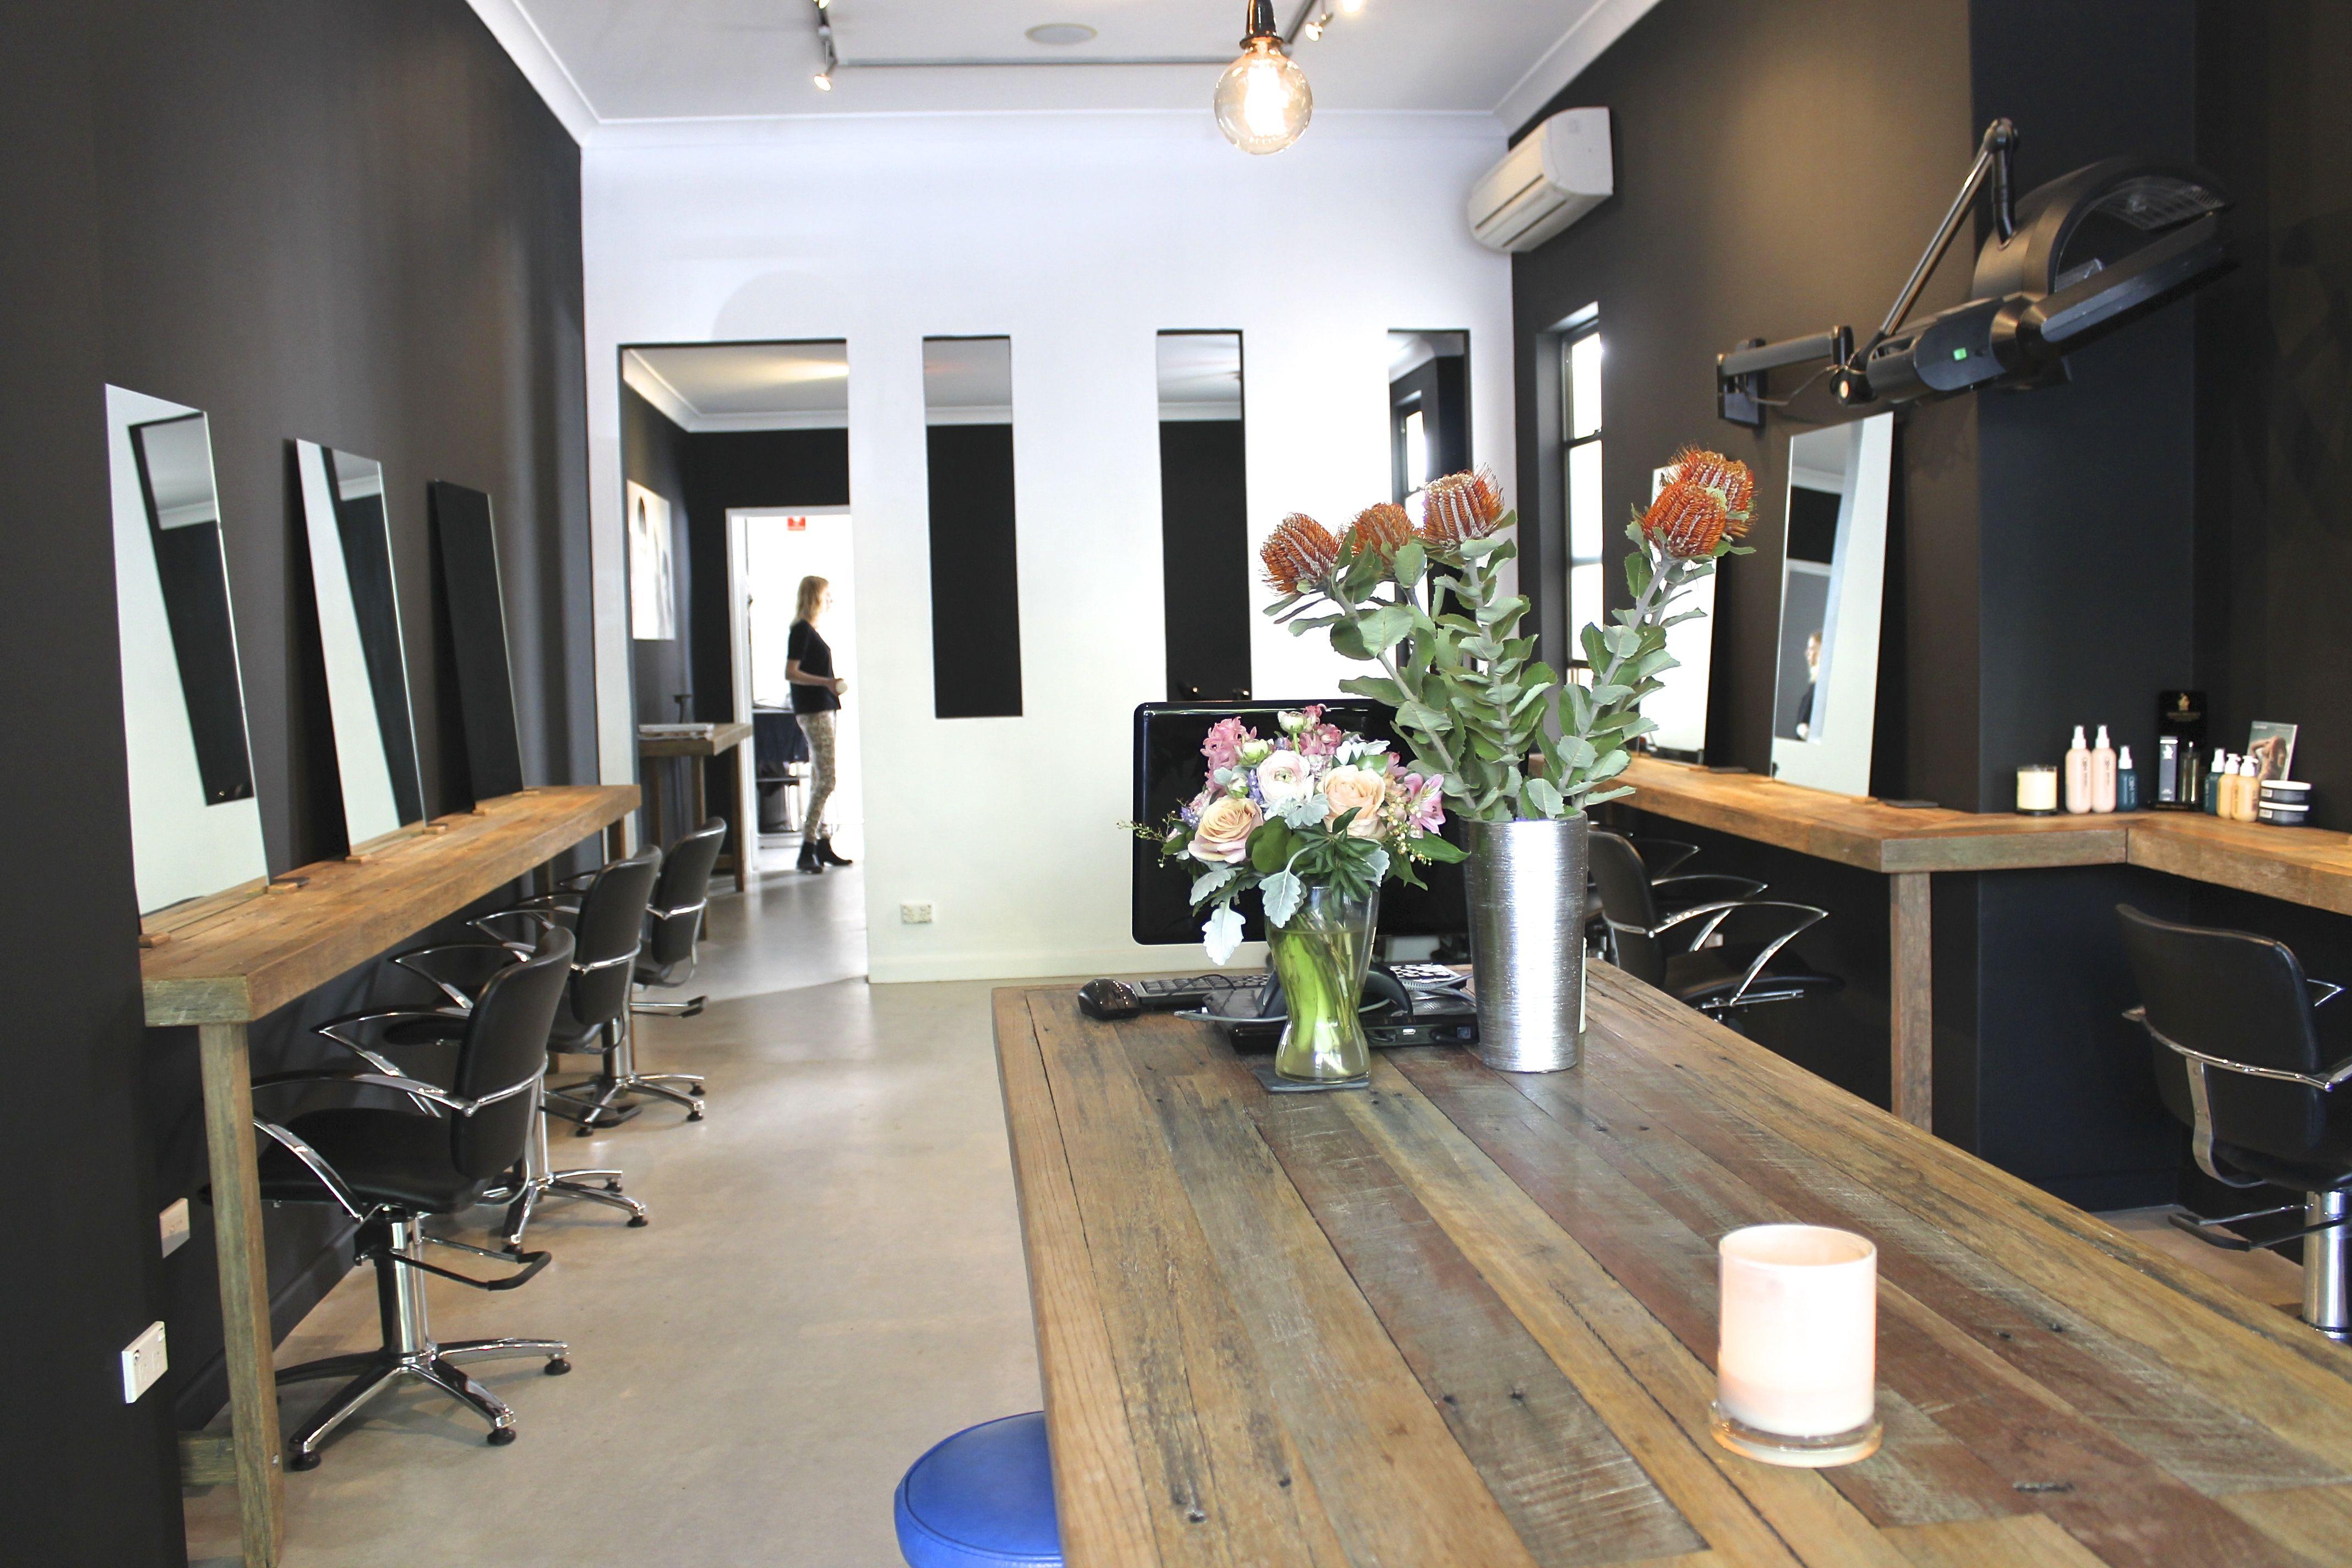 hair salon fit timbermill